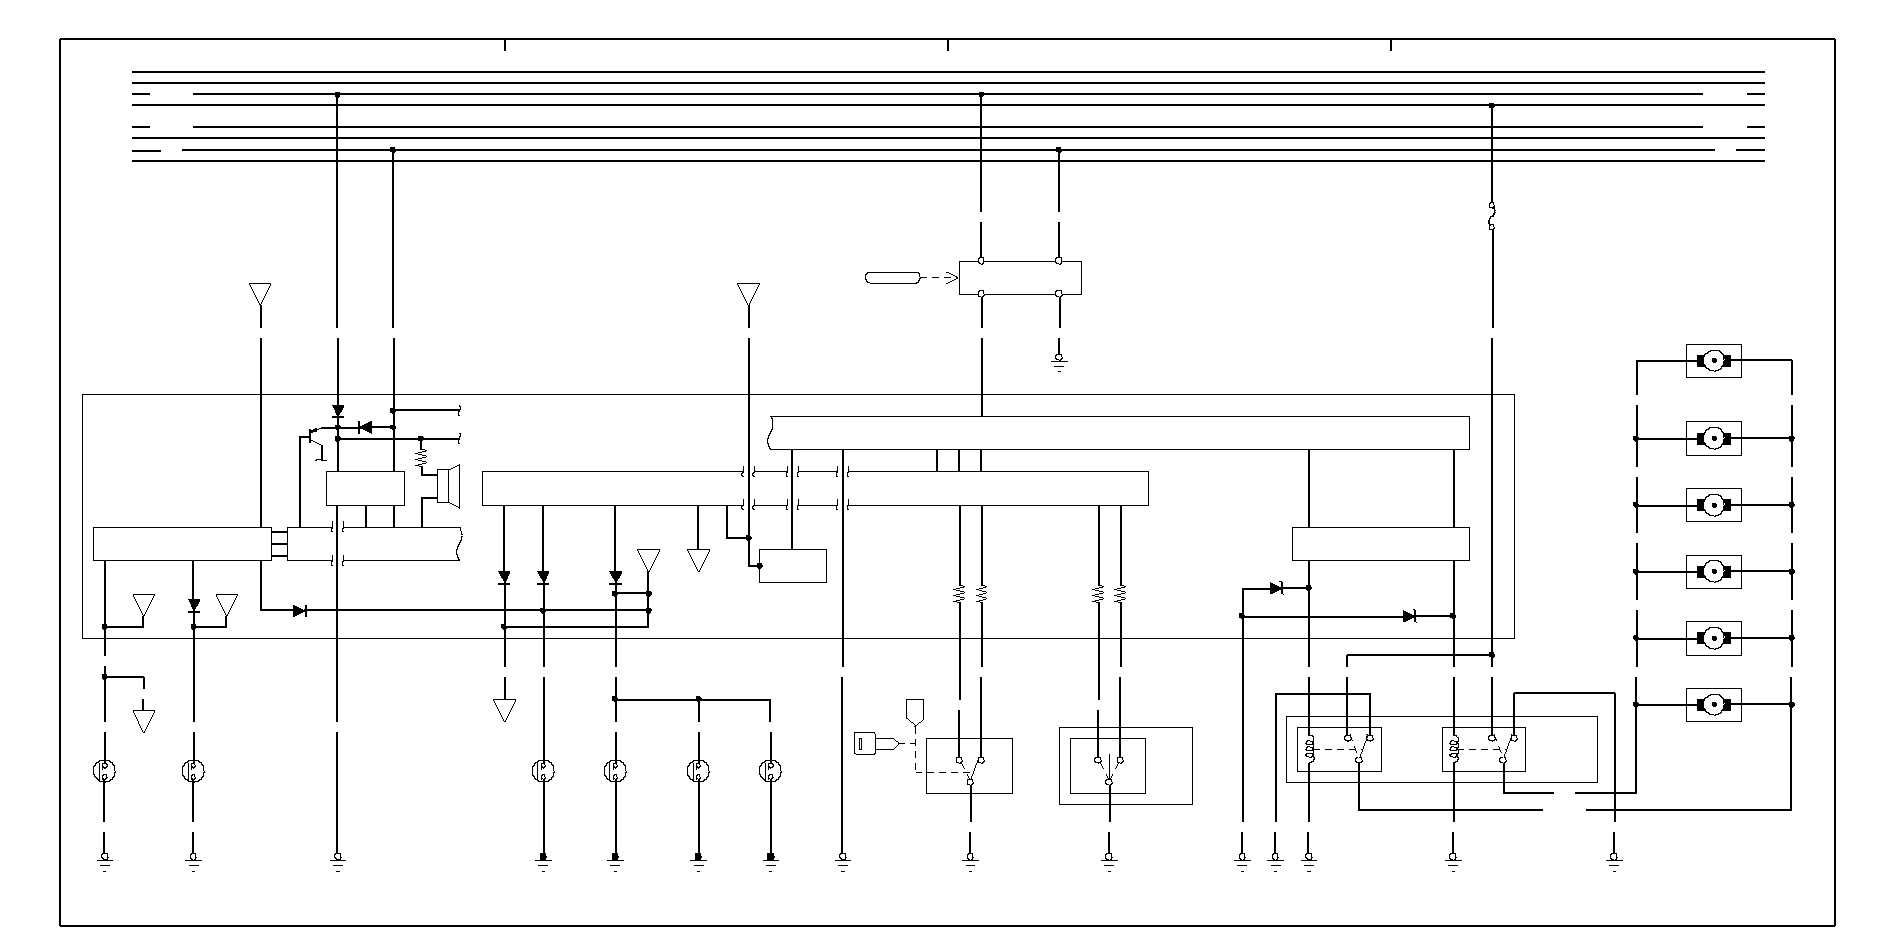 Diagram Honda Jazz 2009 Wiring Diagram Full Version Hd Quality Wiring Diagram Wiringgeeks Laboratoire Herrlisheim Fr